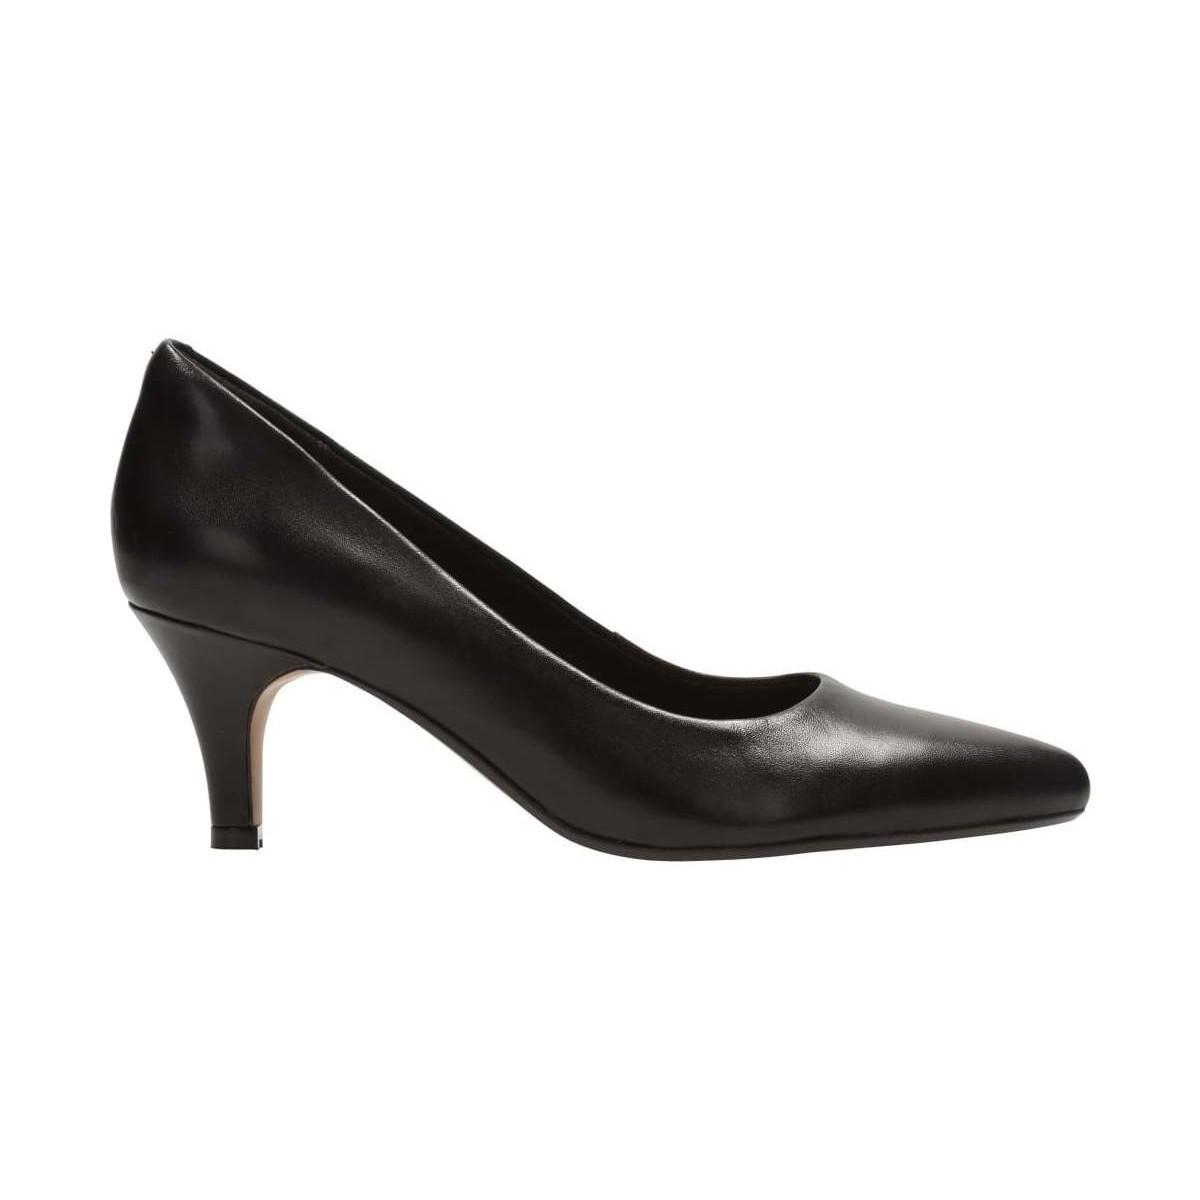 5cbdc811318 Clarks - Isidora Faye Womens Wide Dress Court Shoes Women s Court Shoes In  Black - Lyst. View fullscreen